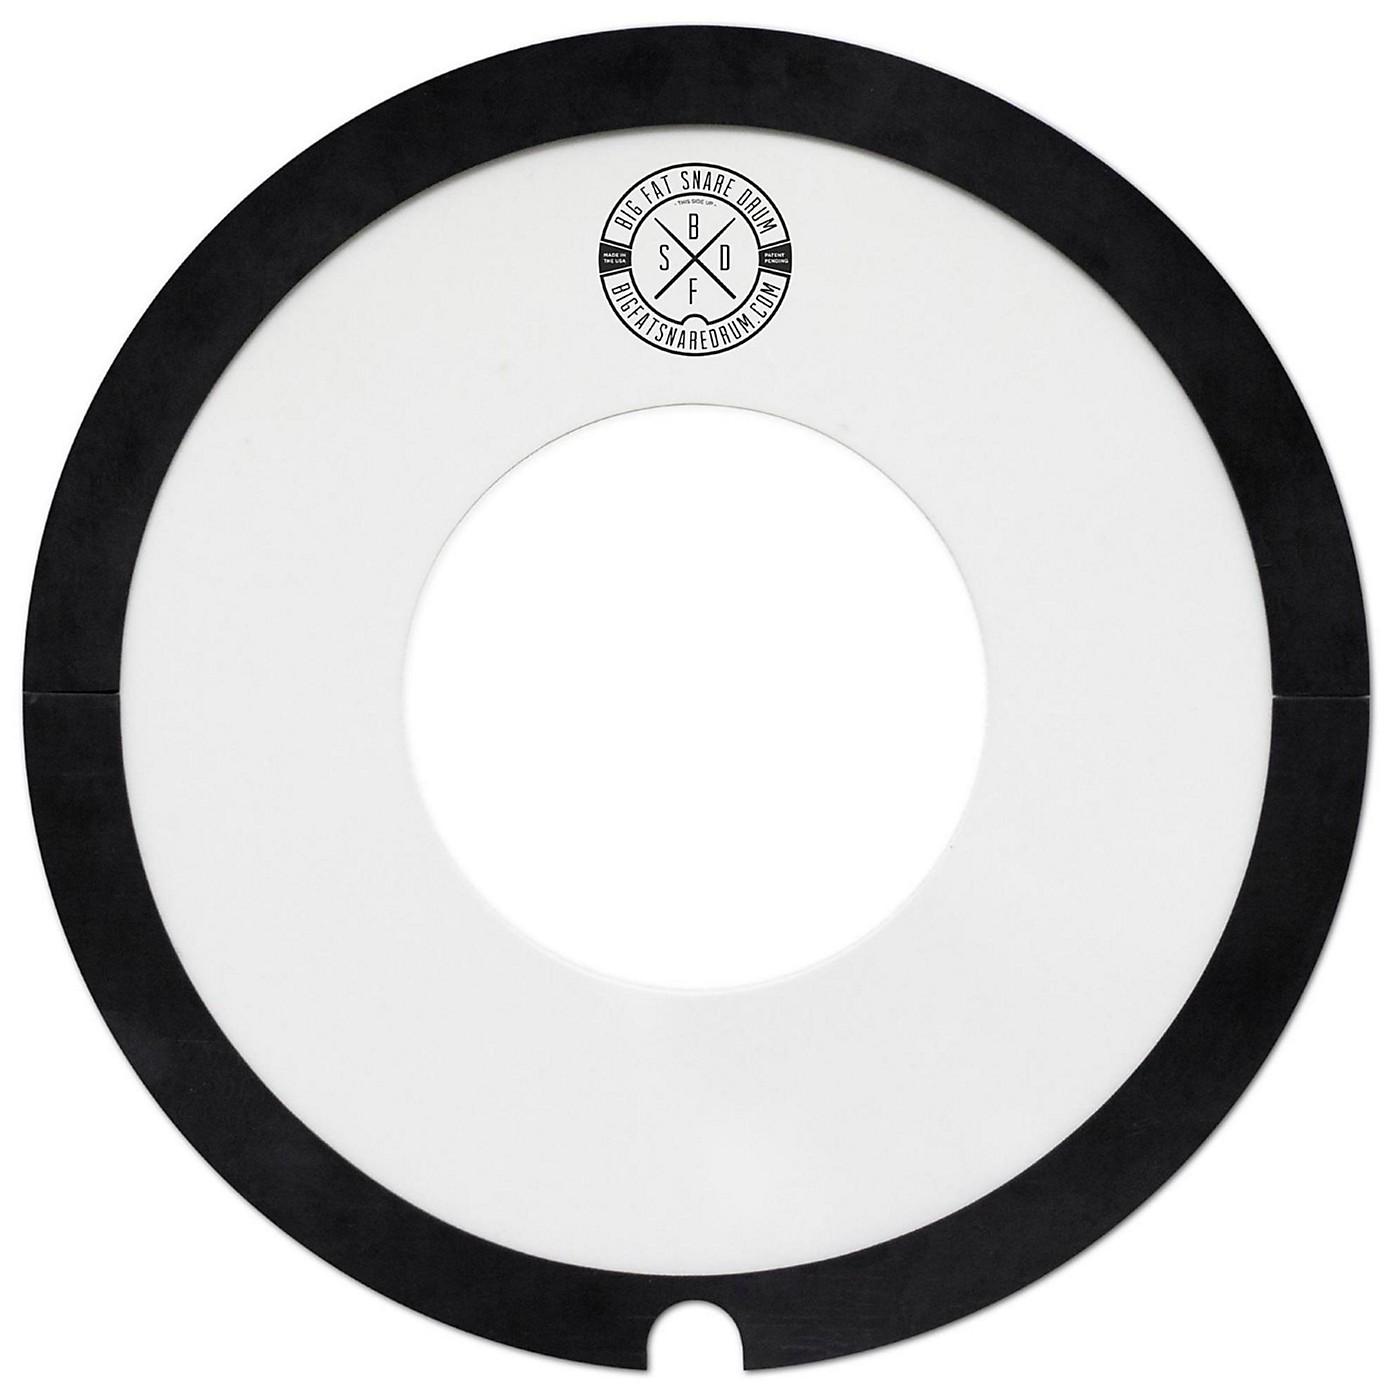 Big Fat Snare Drum Steve's Donut 13 in. thumbnail